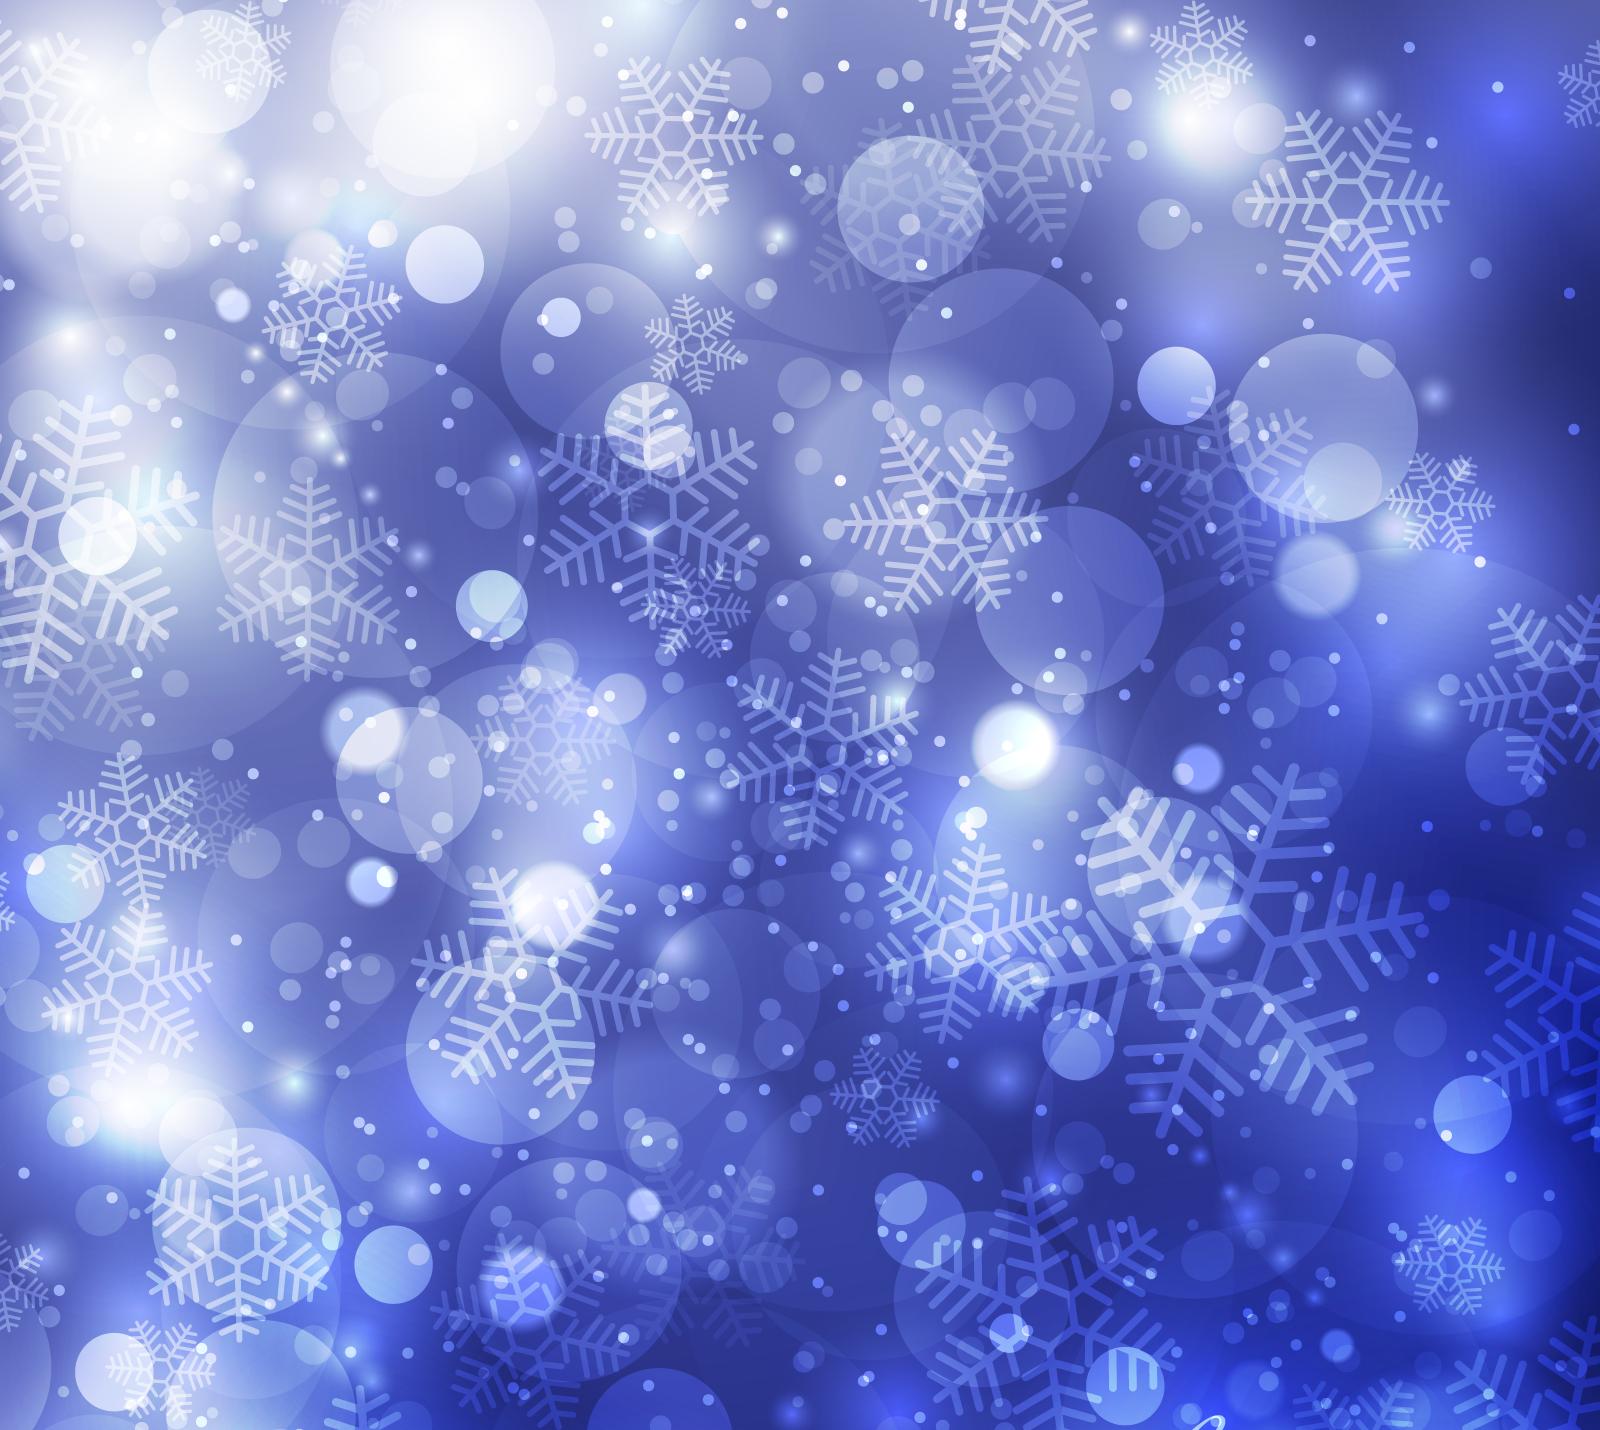 зимний новогодний фон 09